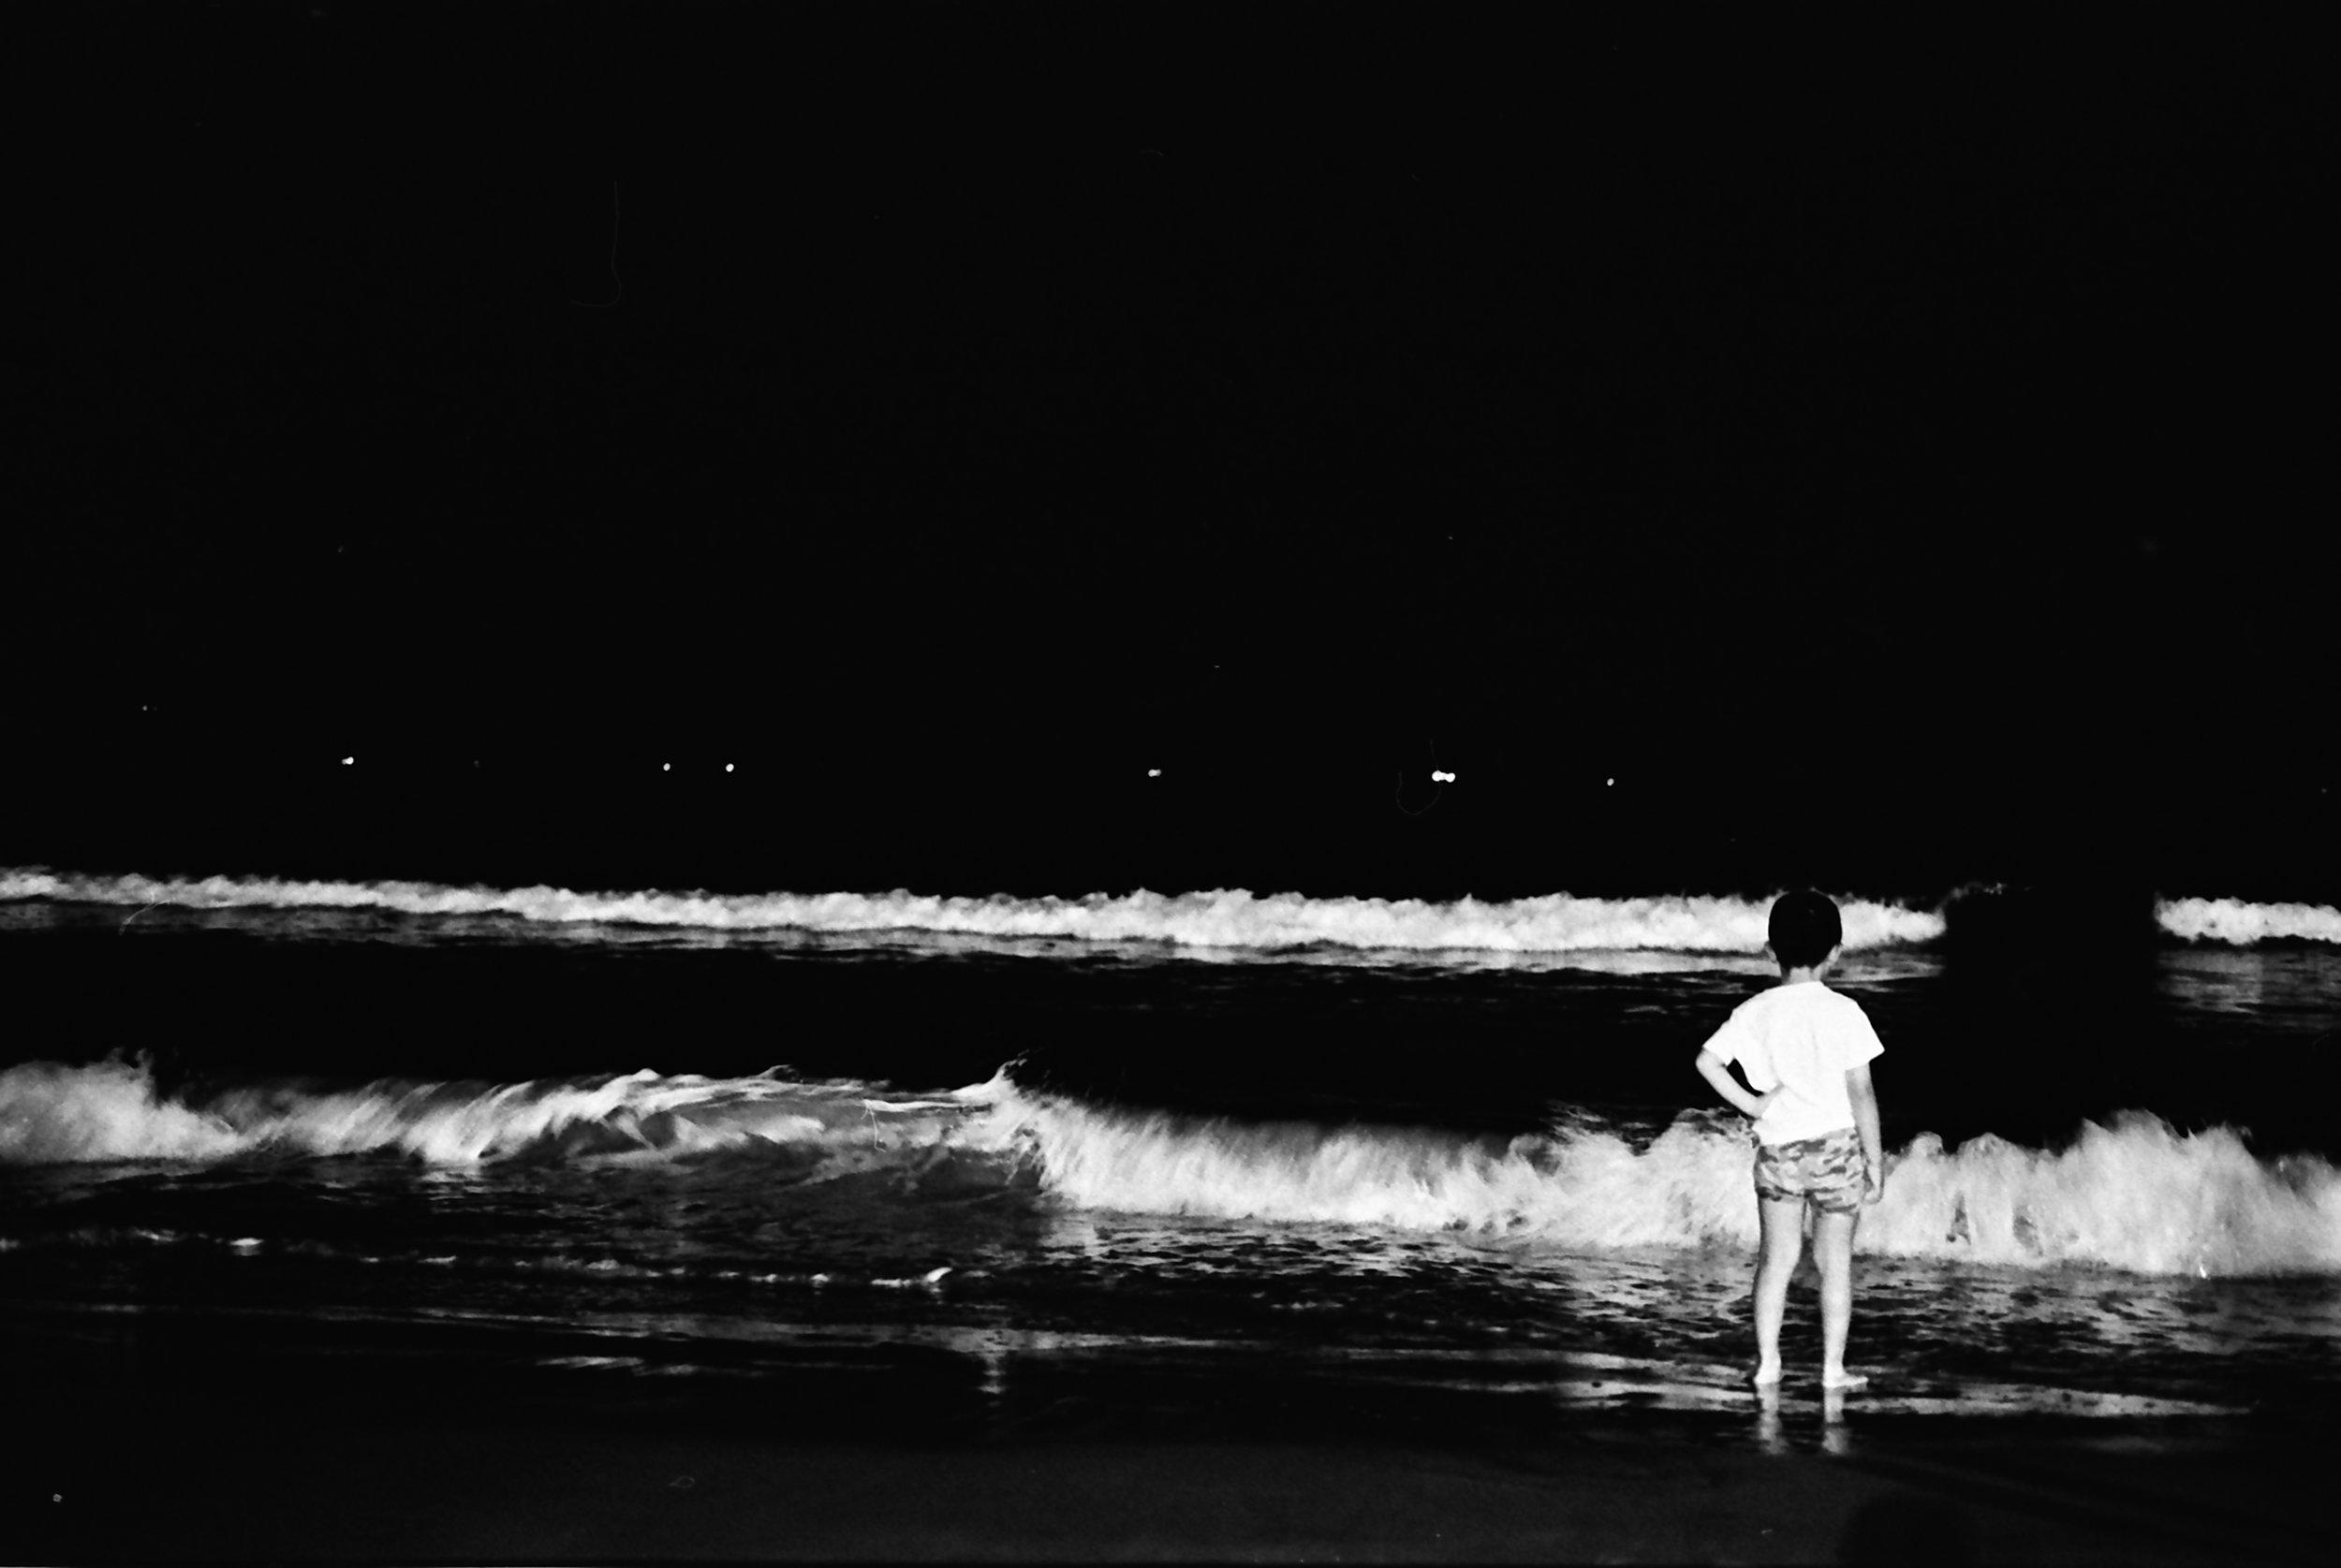 2016_09_02_LeicaM4-2_Kodak400TX_ReisVietnamTessa(3)-2.jpg